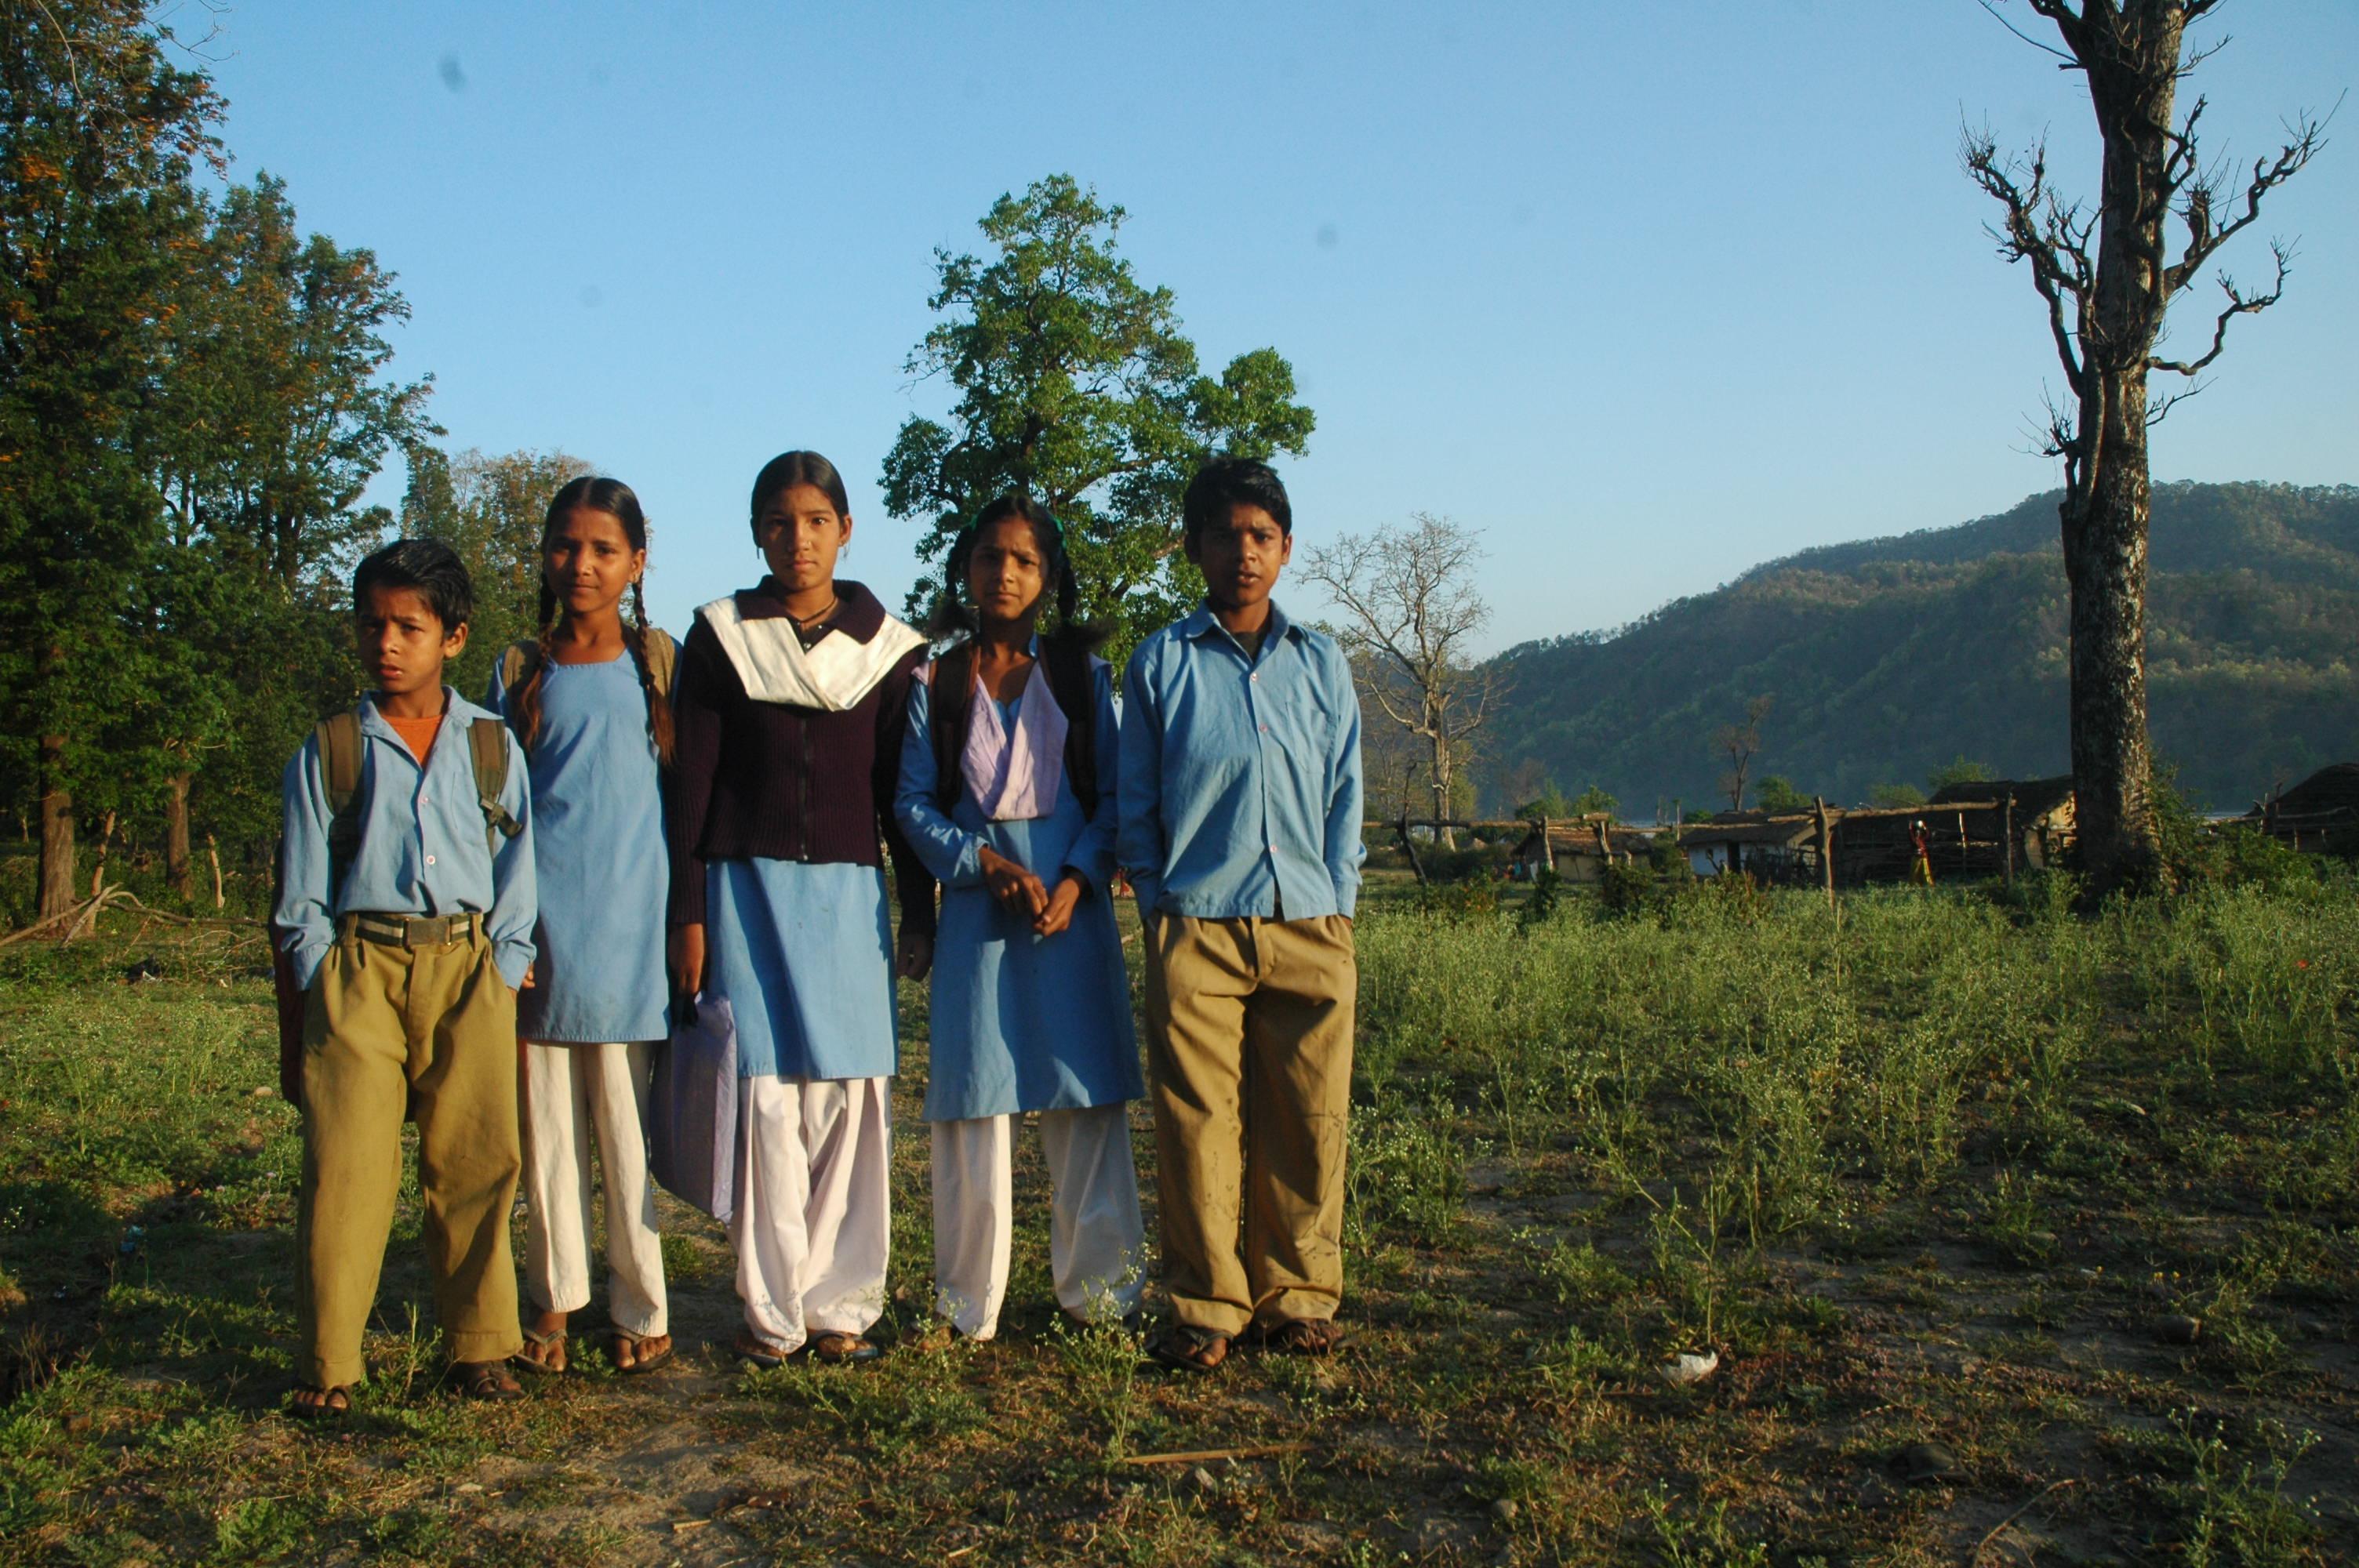 TAME ONES,Jim Corbett wild life sanctuary, Uttarakhand, India